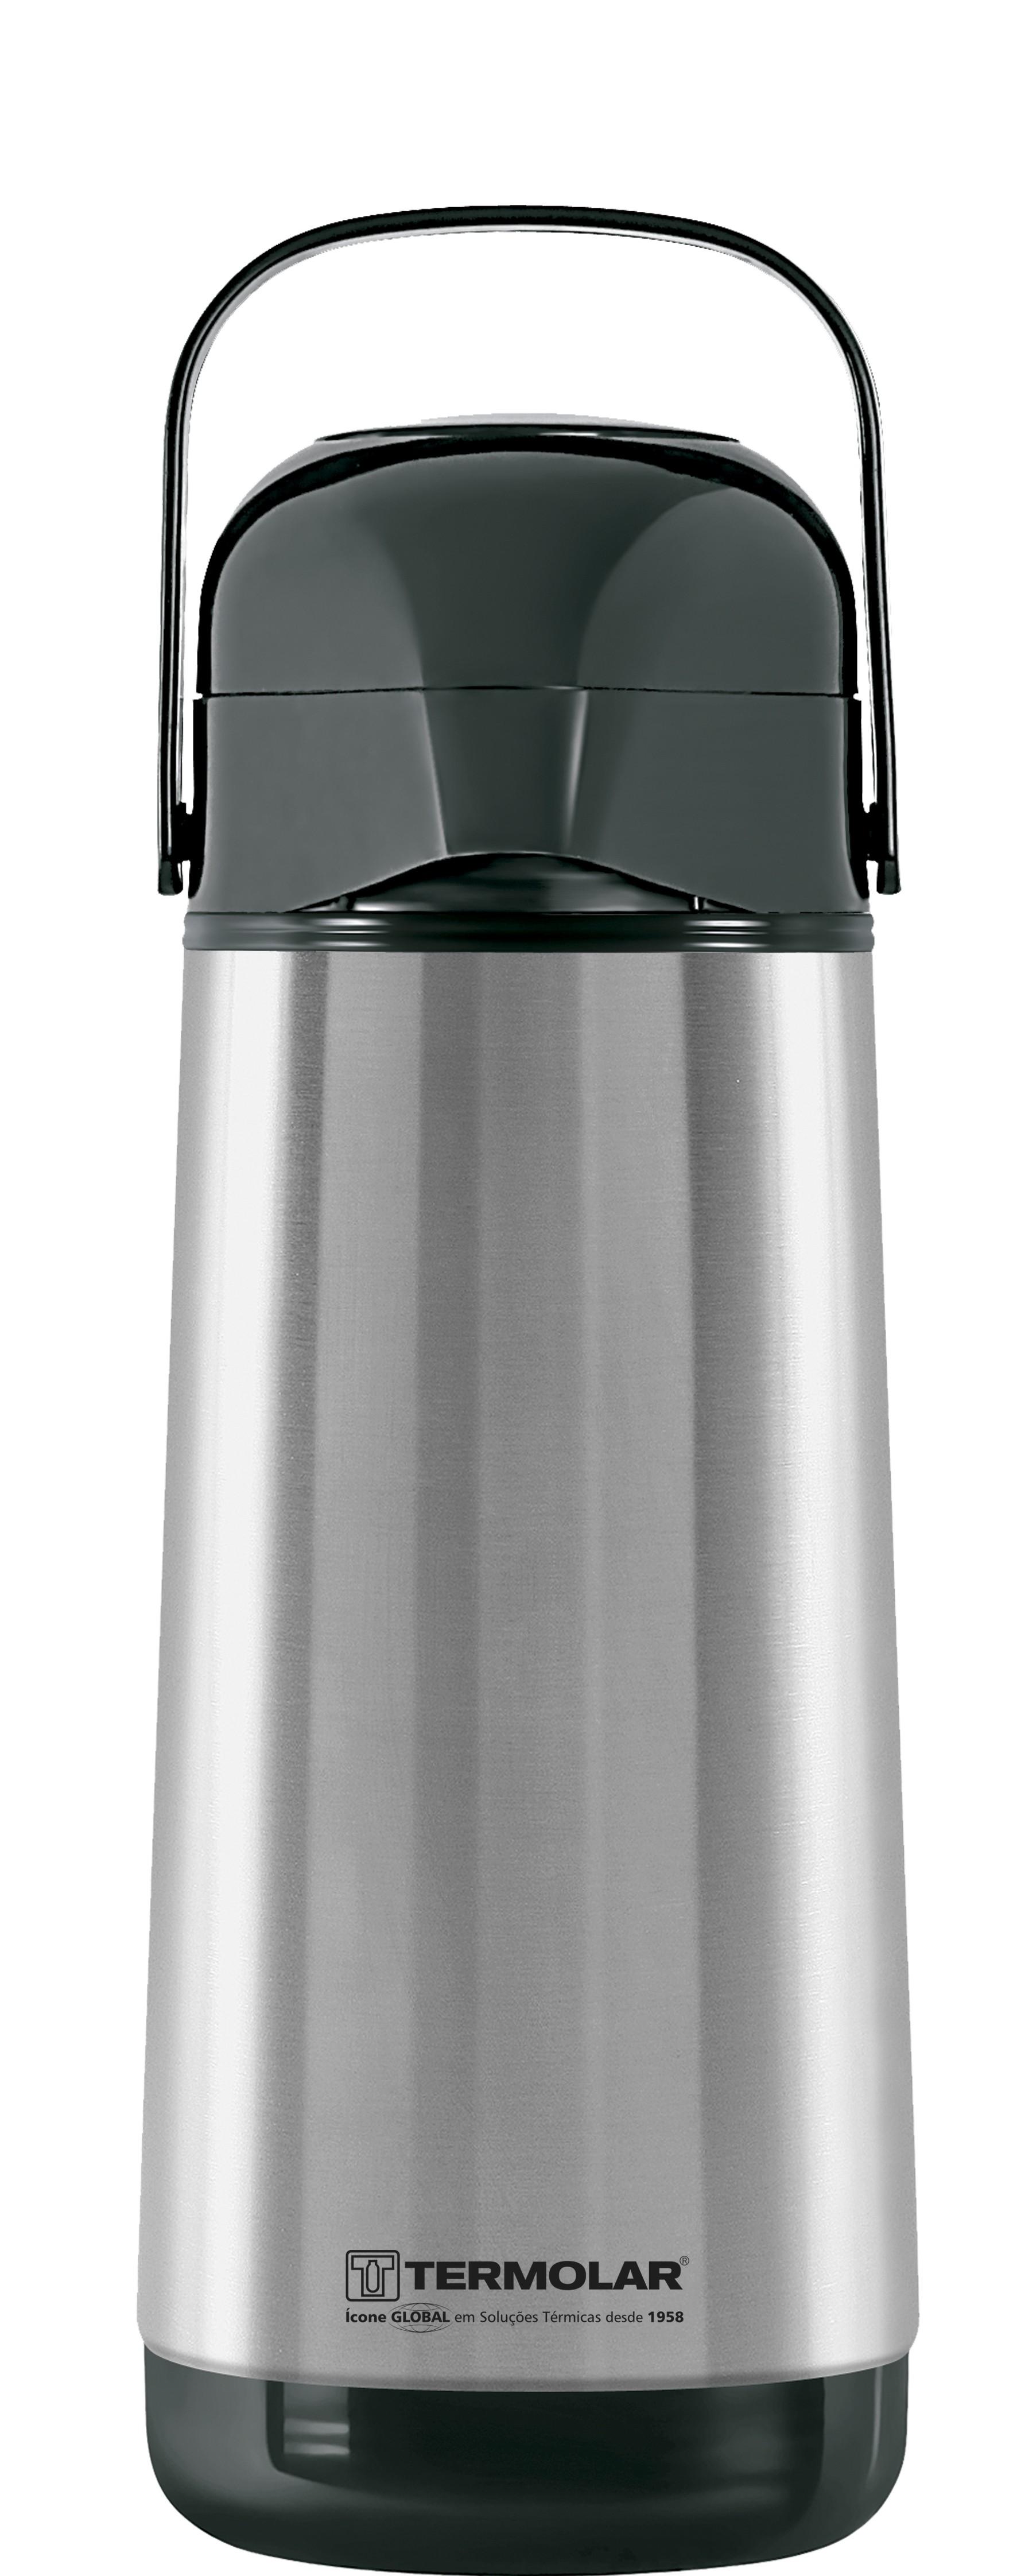 Garrafa Térmica Lúmina 1 litro INOX - TERMOLAR